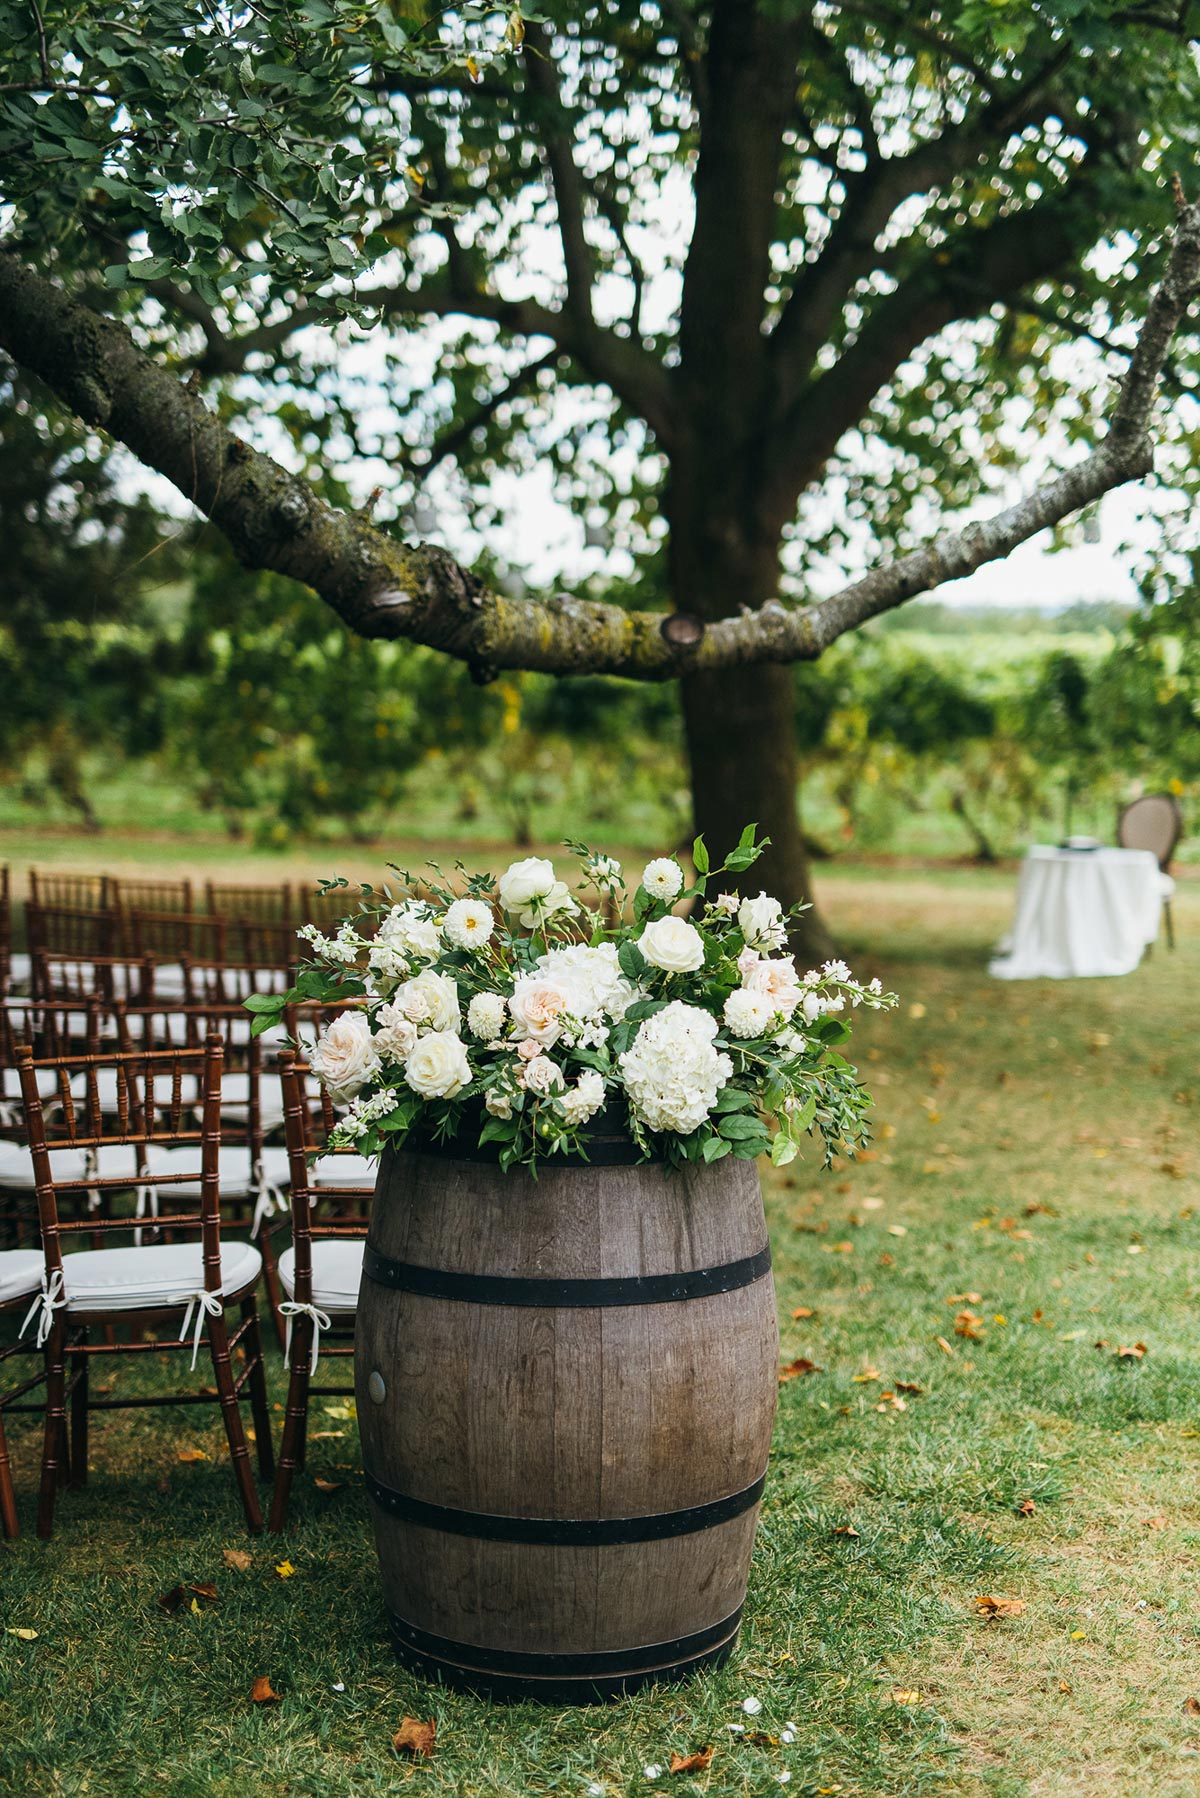 shaw-events-vineyard-bride-swish-list-kurtz-orchards-niagara-on-the-lake-wedding-21.jpg